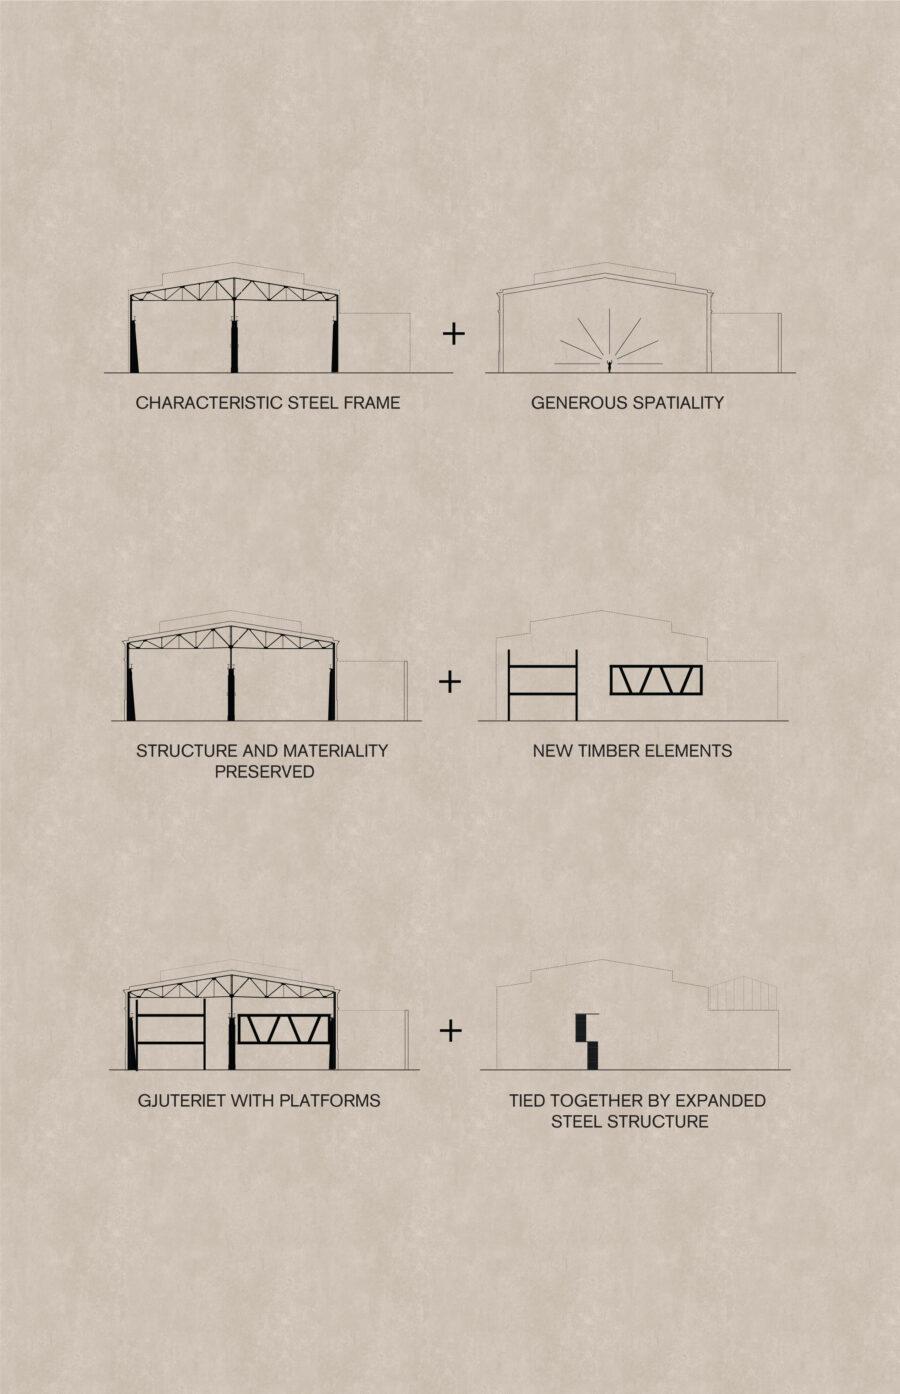 KjellanderSjoberg Gjuteriet Concept Diagram 06 Eng 3600x2324px